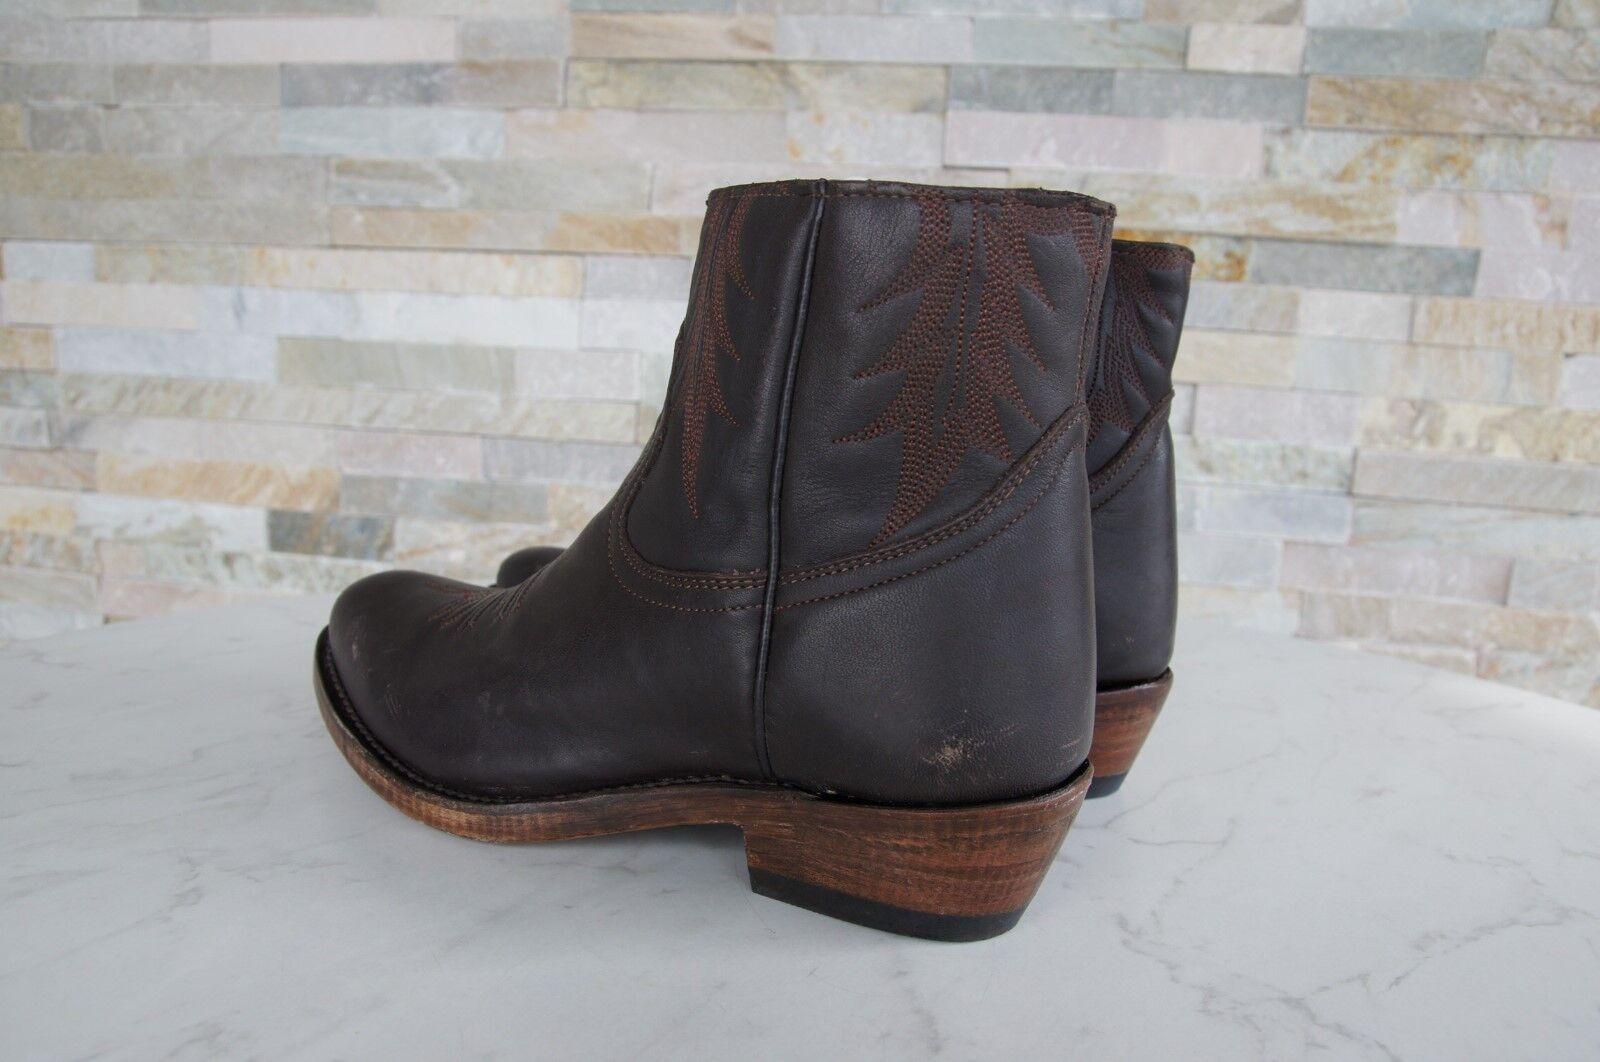 ASH Gr 38,5 Booties Schuhe braun Stiefeletten Vintage Country Kut braun Schuhe neu fb5740